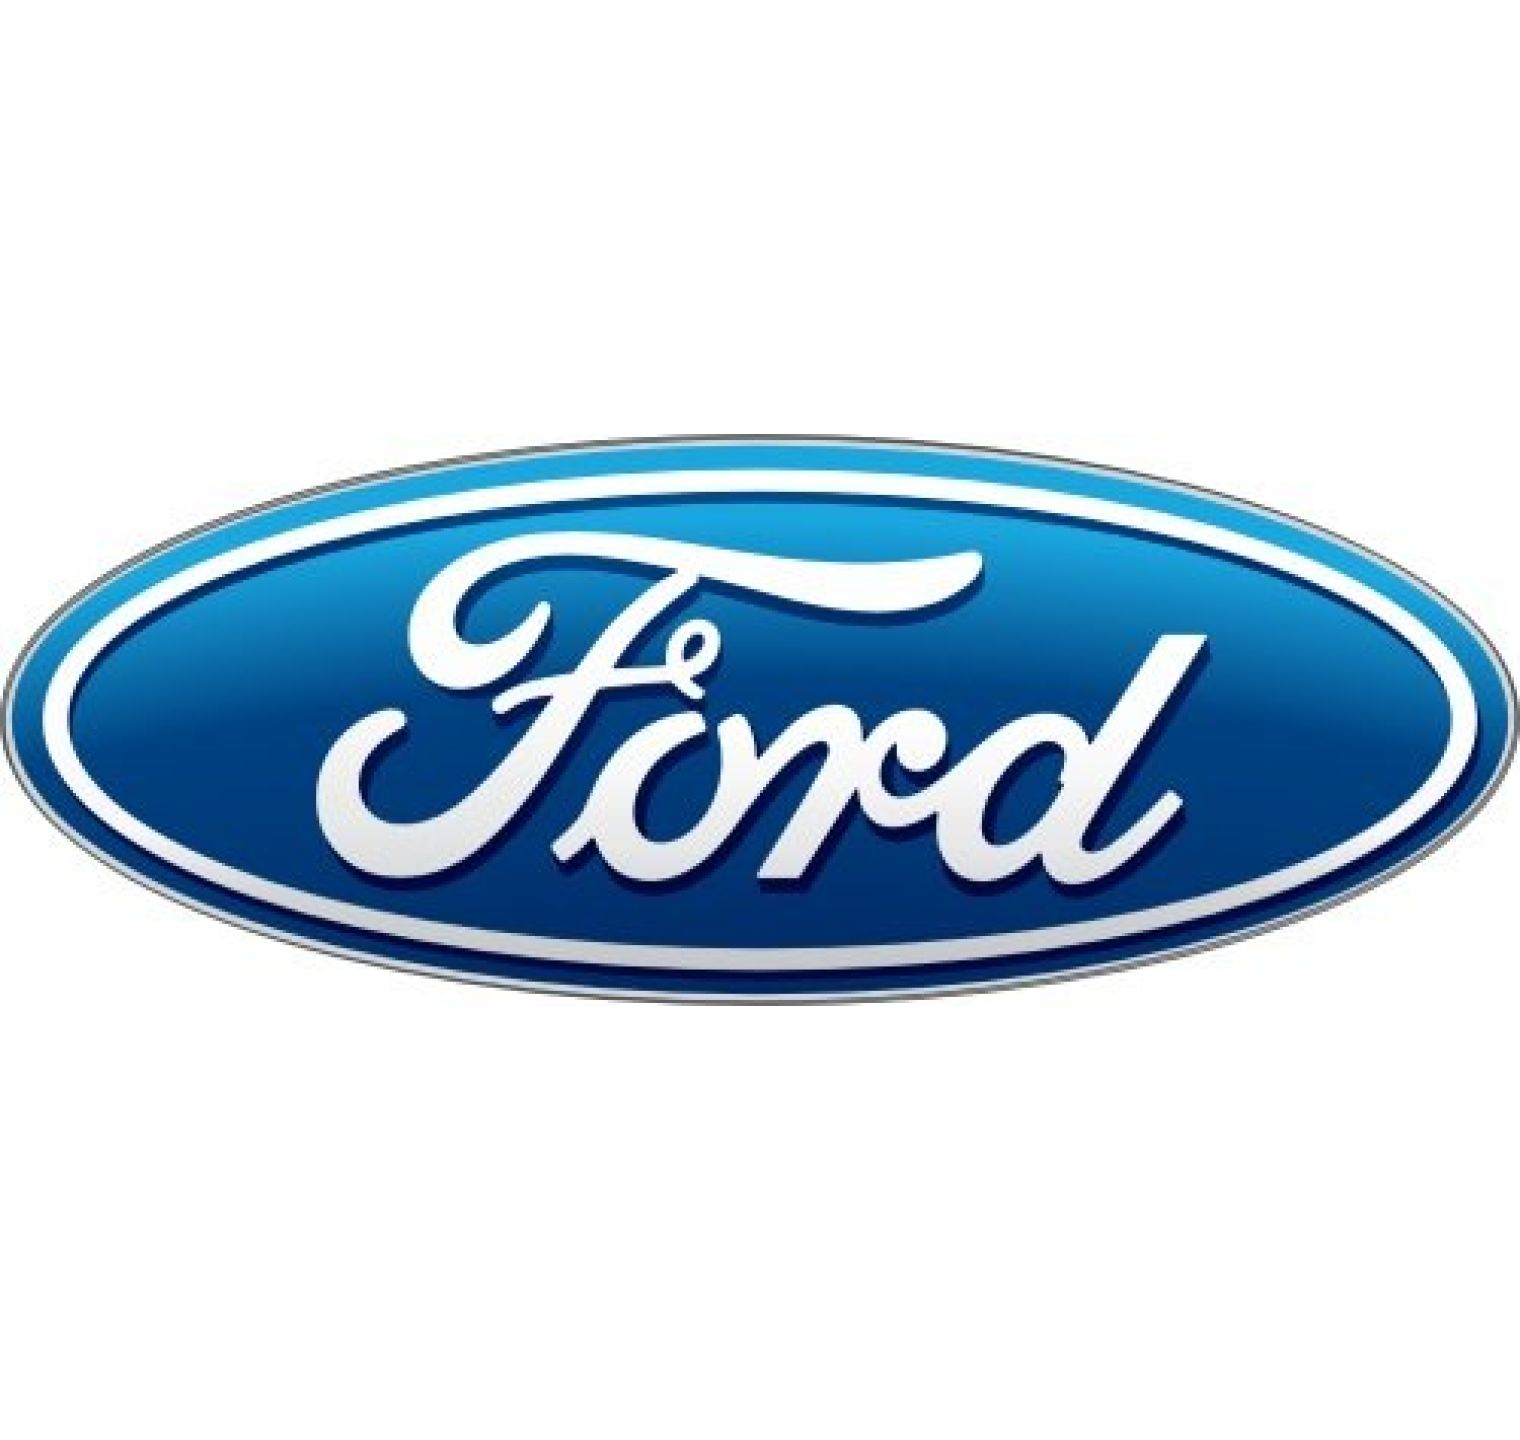 Ford Mondeo V Station (vanaf 2015) - achterruitenwisser Valeo Silencio flatblade